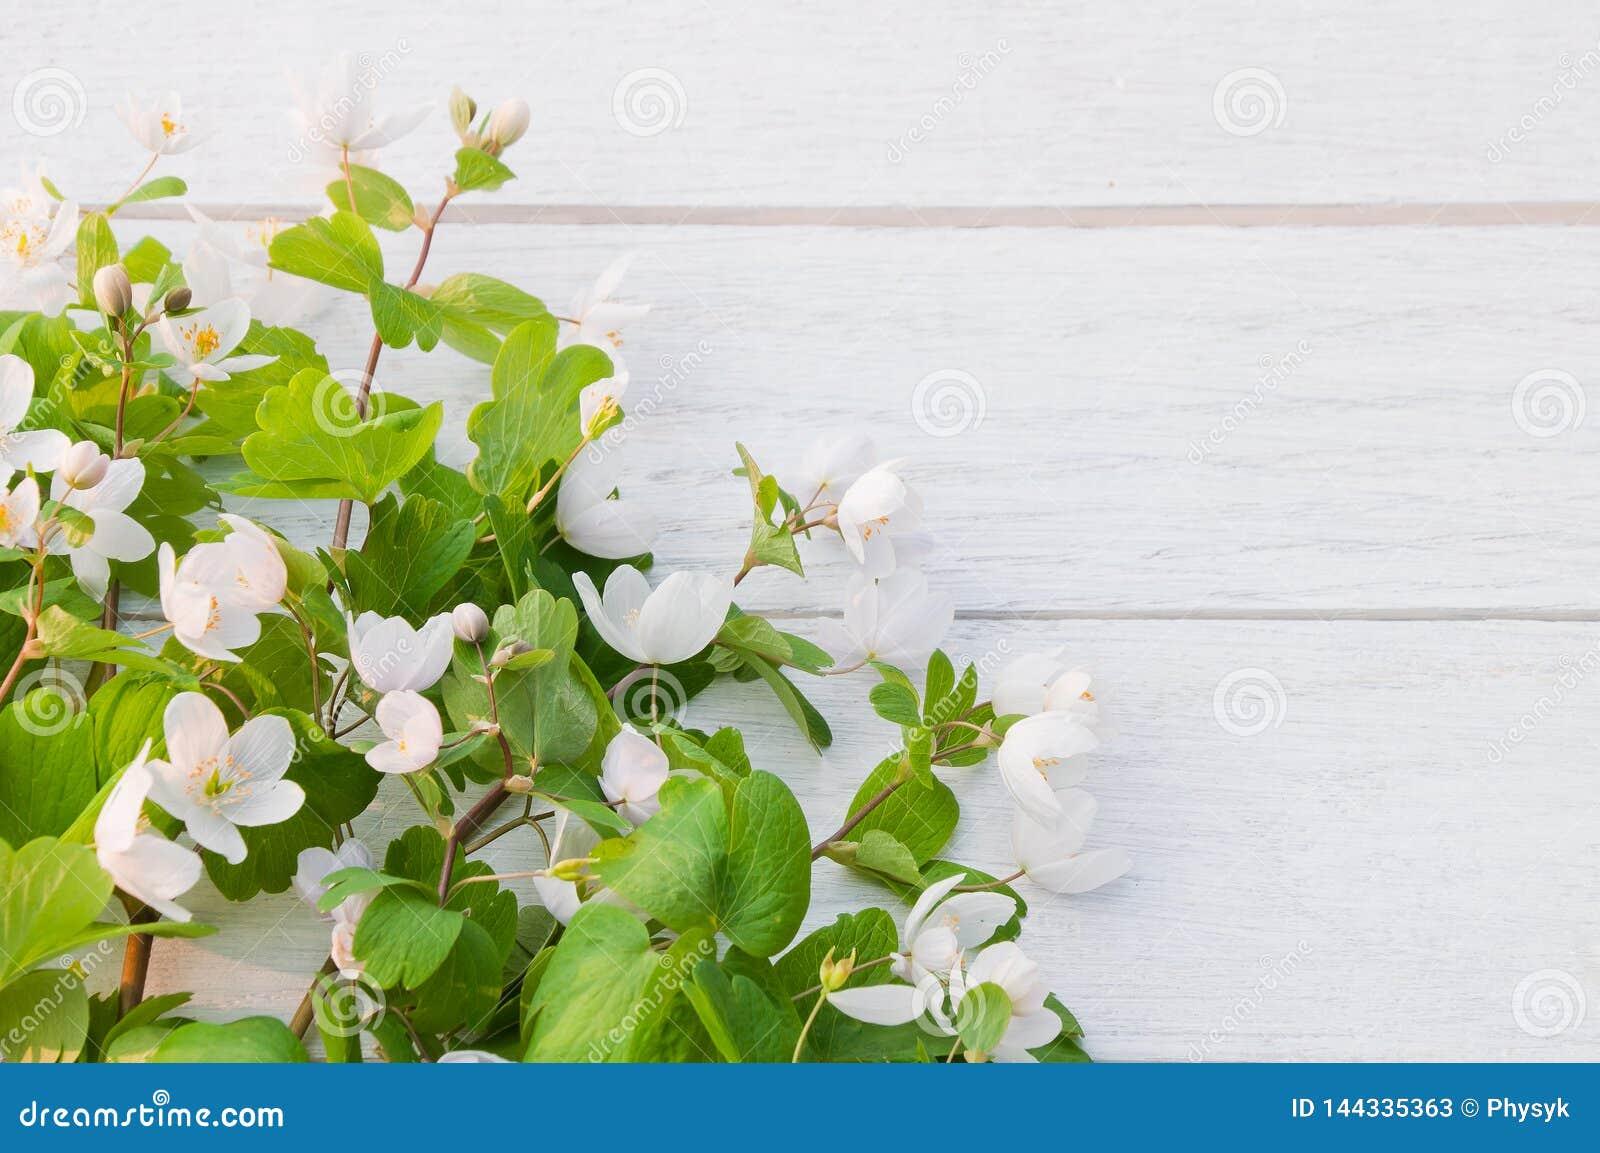 Tabladel woodendel whitedel adel ondel thalictroidesde Isopyrumdel flowersdel forestdel whitede BeautifulÂ